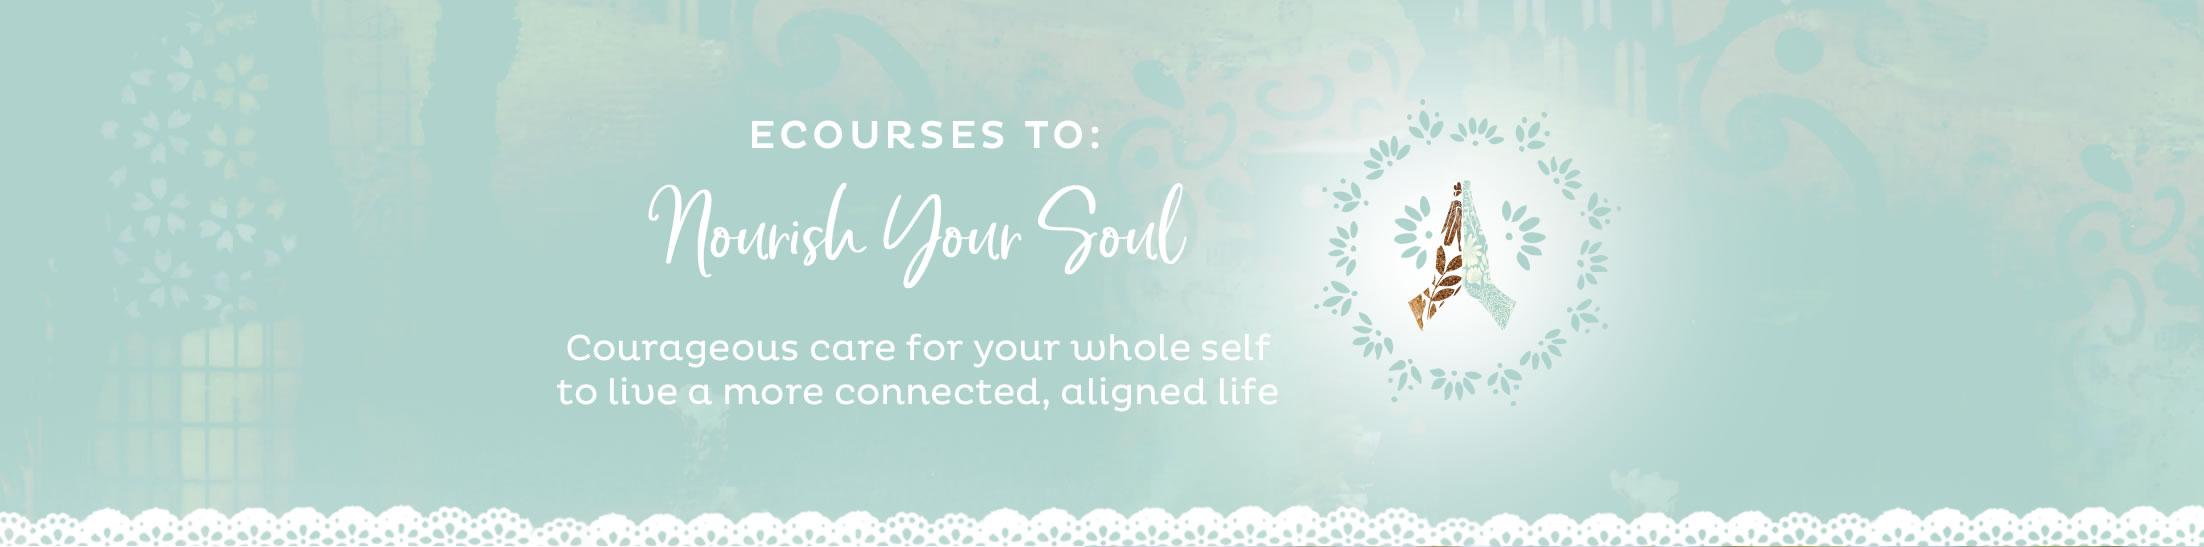 eCourses to Nourish Your Soul